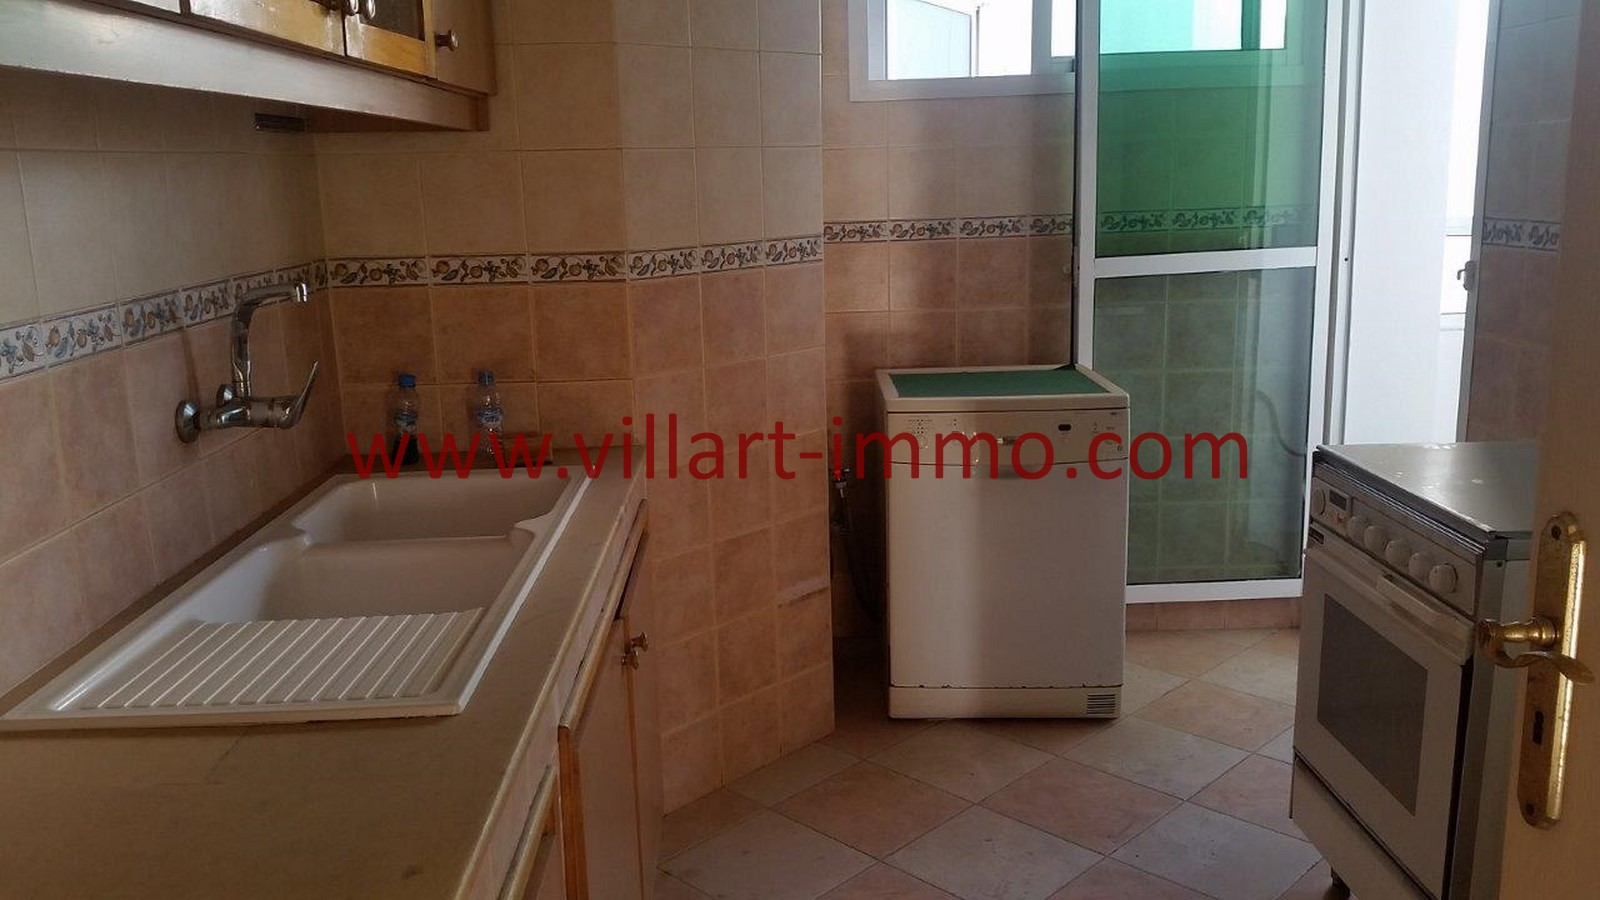 3-location-appartement-meubles-tanger-iberia-cuisine-l1012-villart-immo-maroc